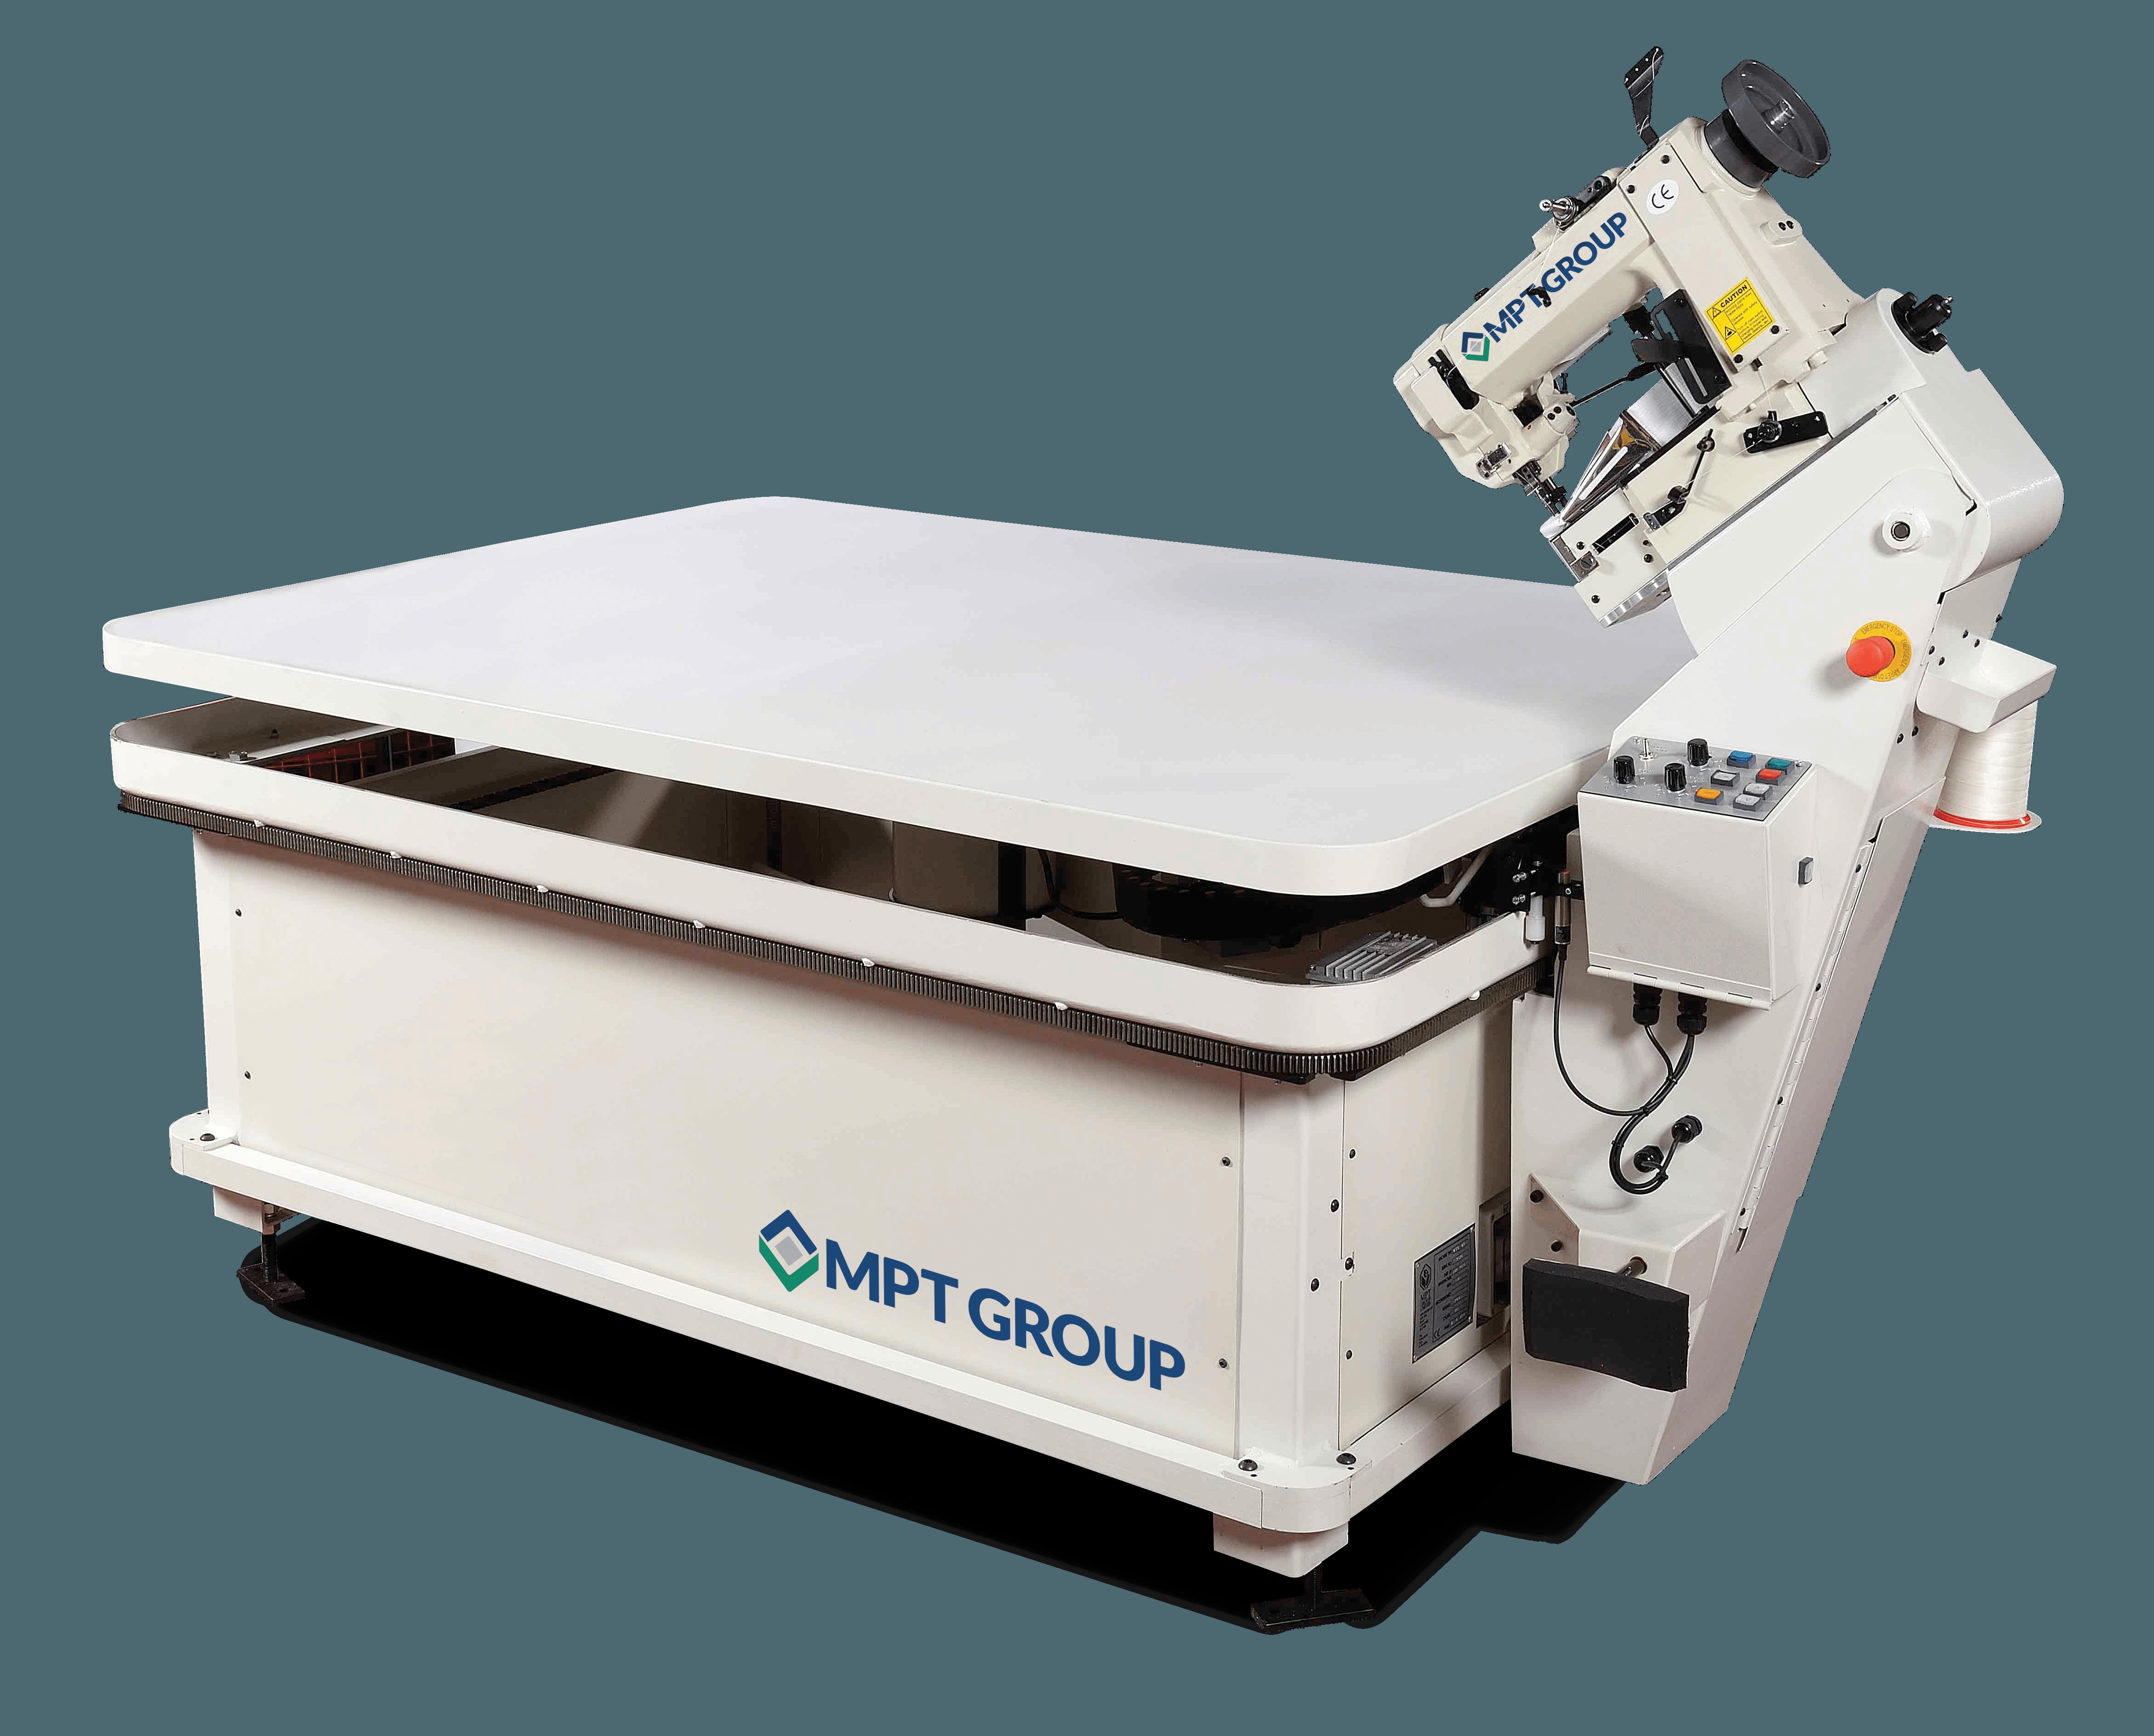 Matramax A high speed electronic tape edge machine